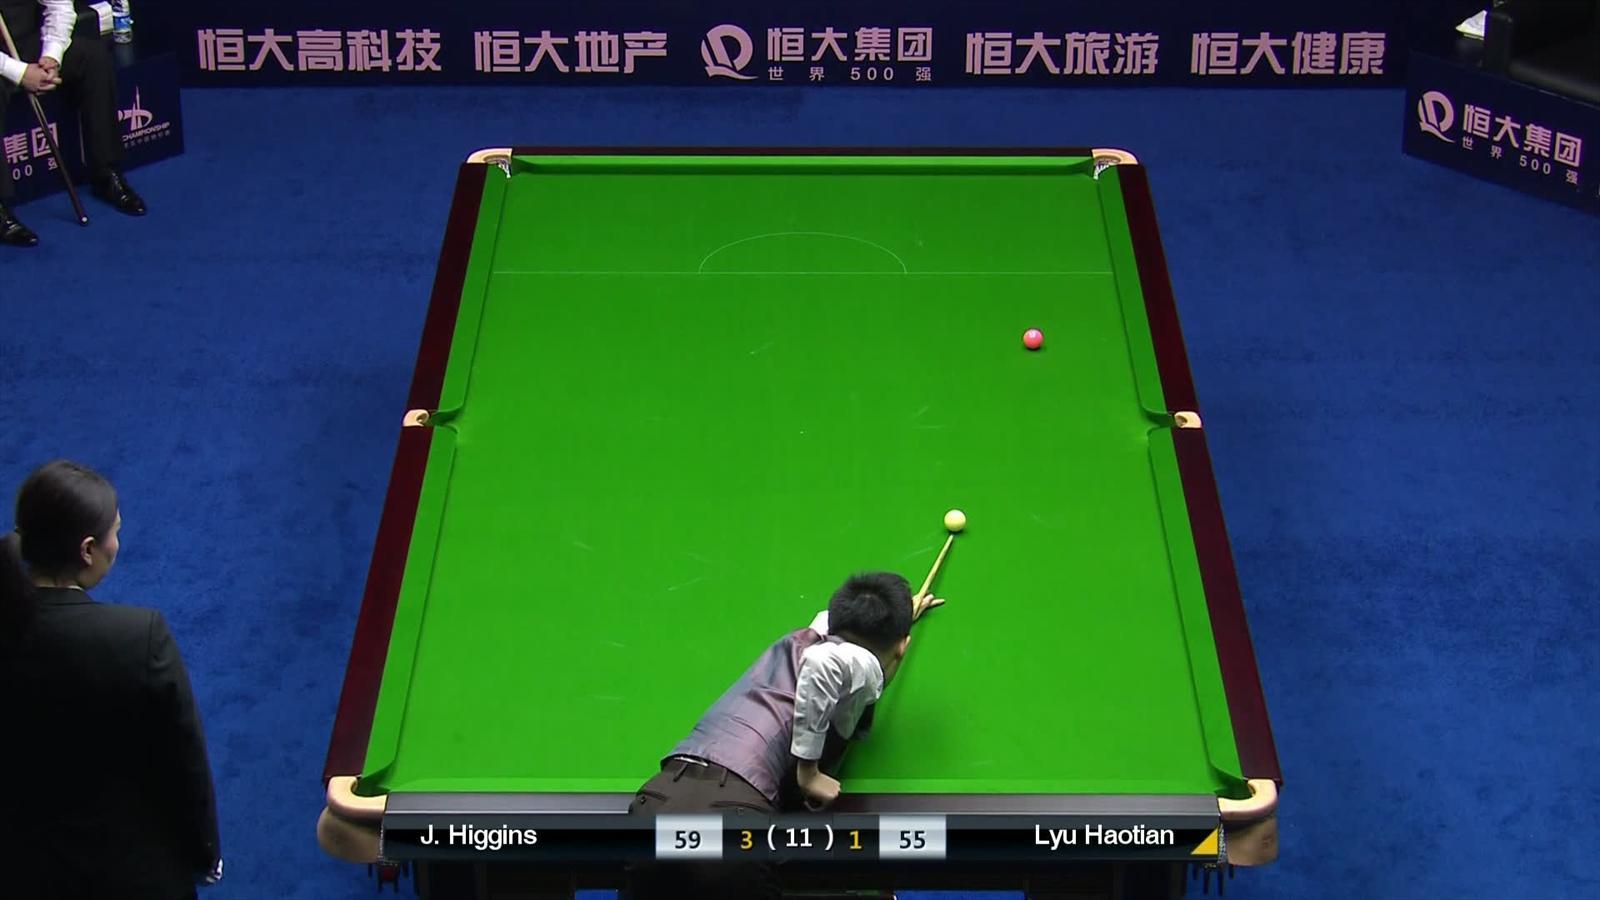 Lyu Haotian misses long pink to lose key game